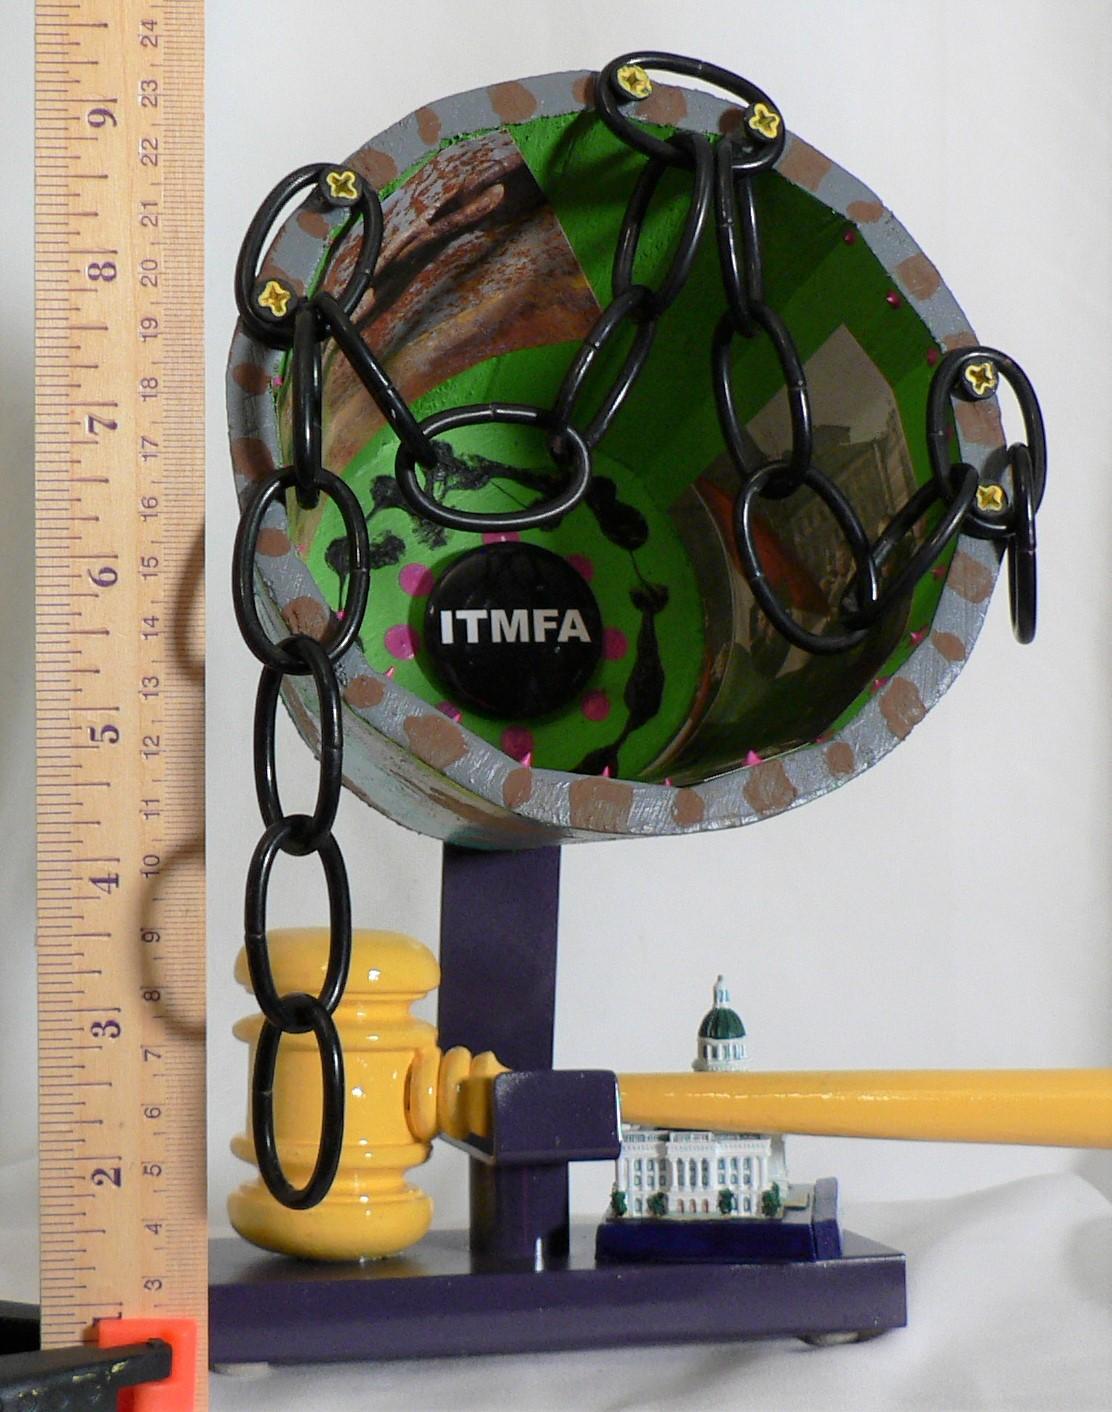 ITMFA Ruler.JPG